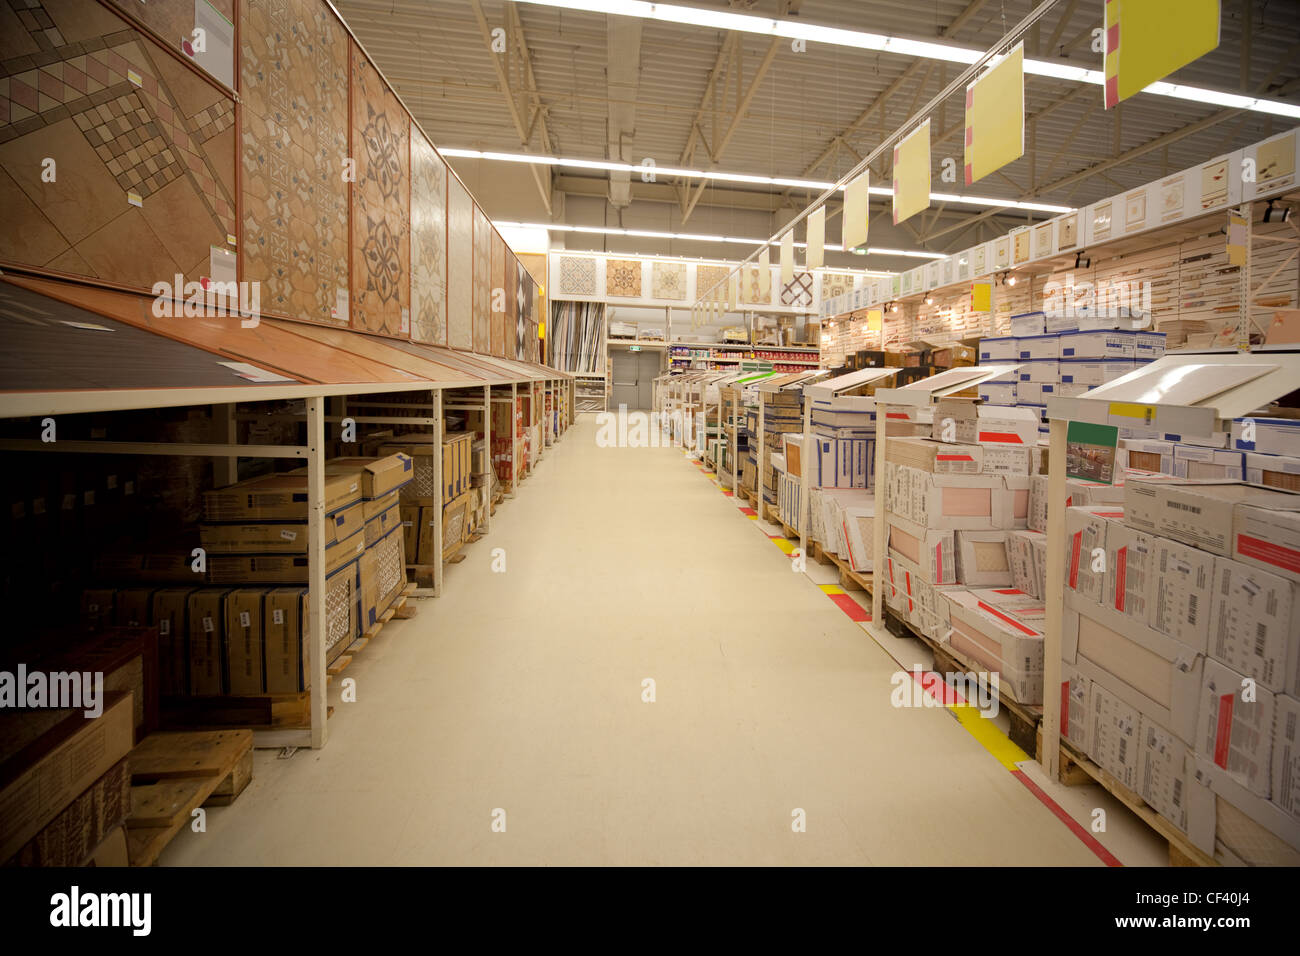 Ceramic tile warehouse image collections tile flooring design ideas ceramic tile works omaha choice image tile flooring design ideas ceramic tile warehouse cardiff images tile doublecrazyfo Images